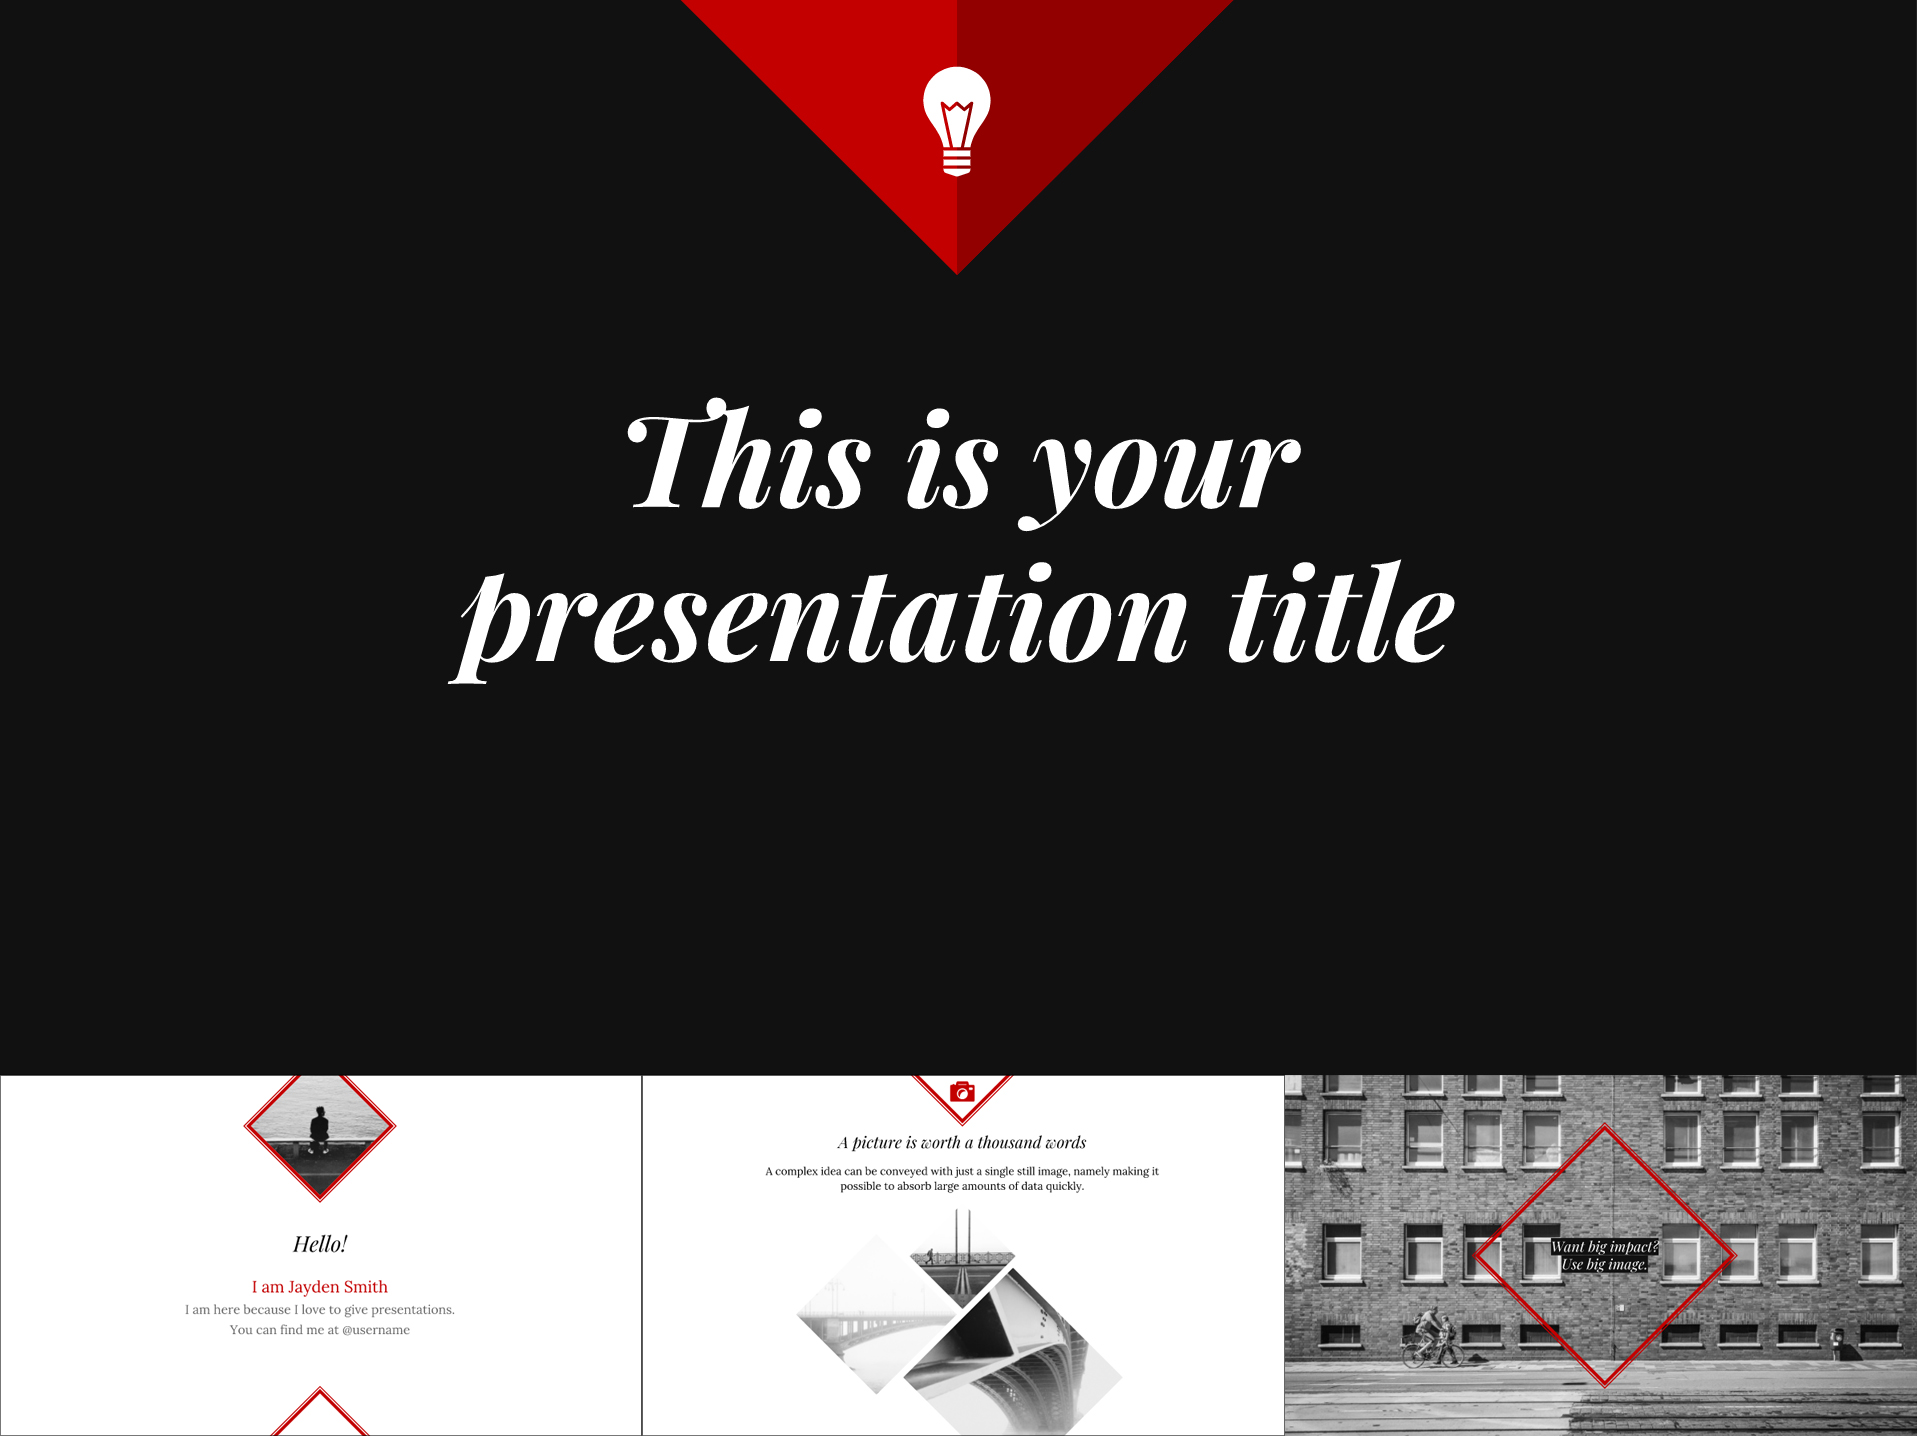 Elegant Minimalist Google Slides Presentation Template - The Internet Tips